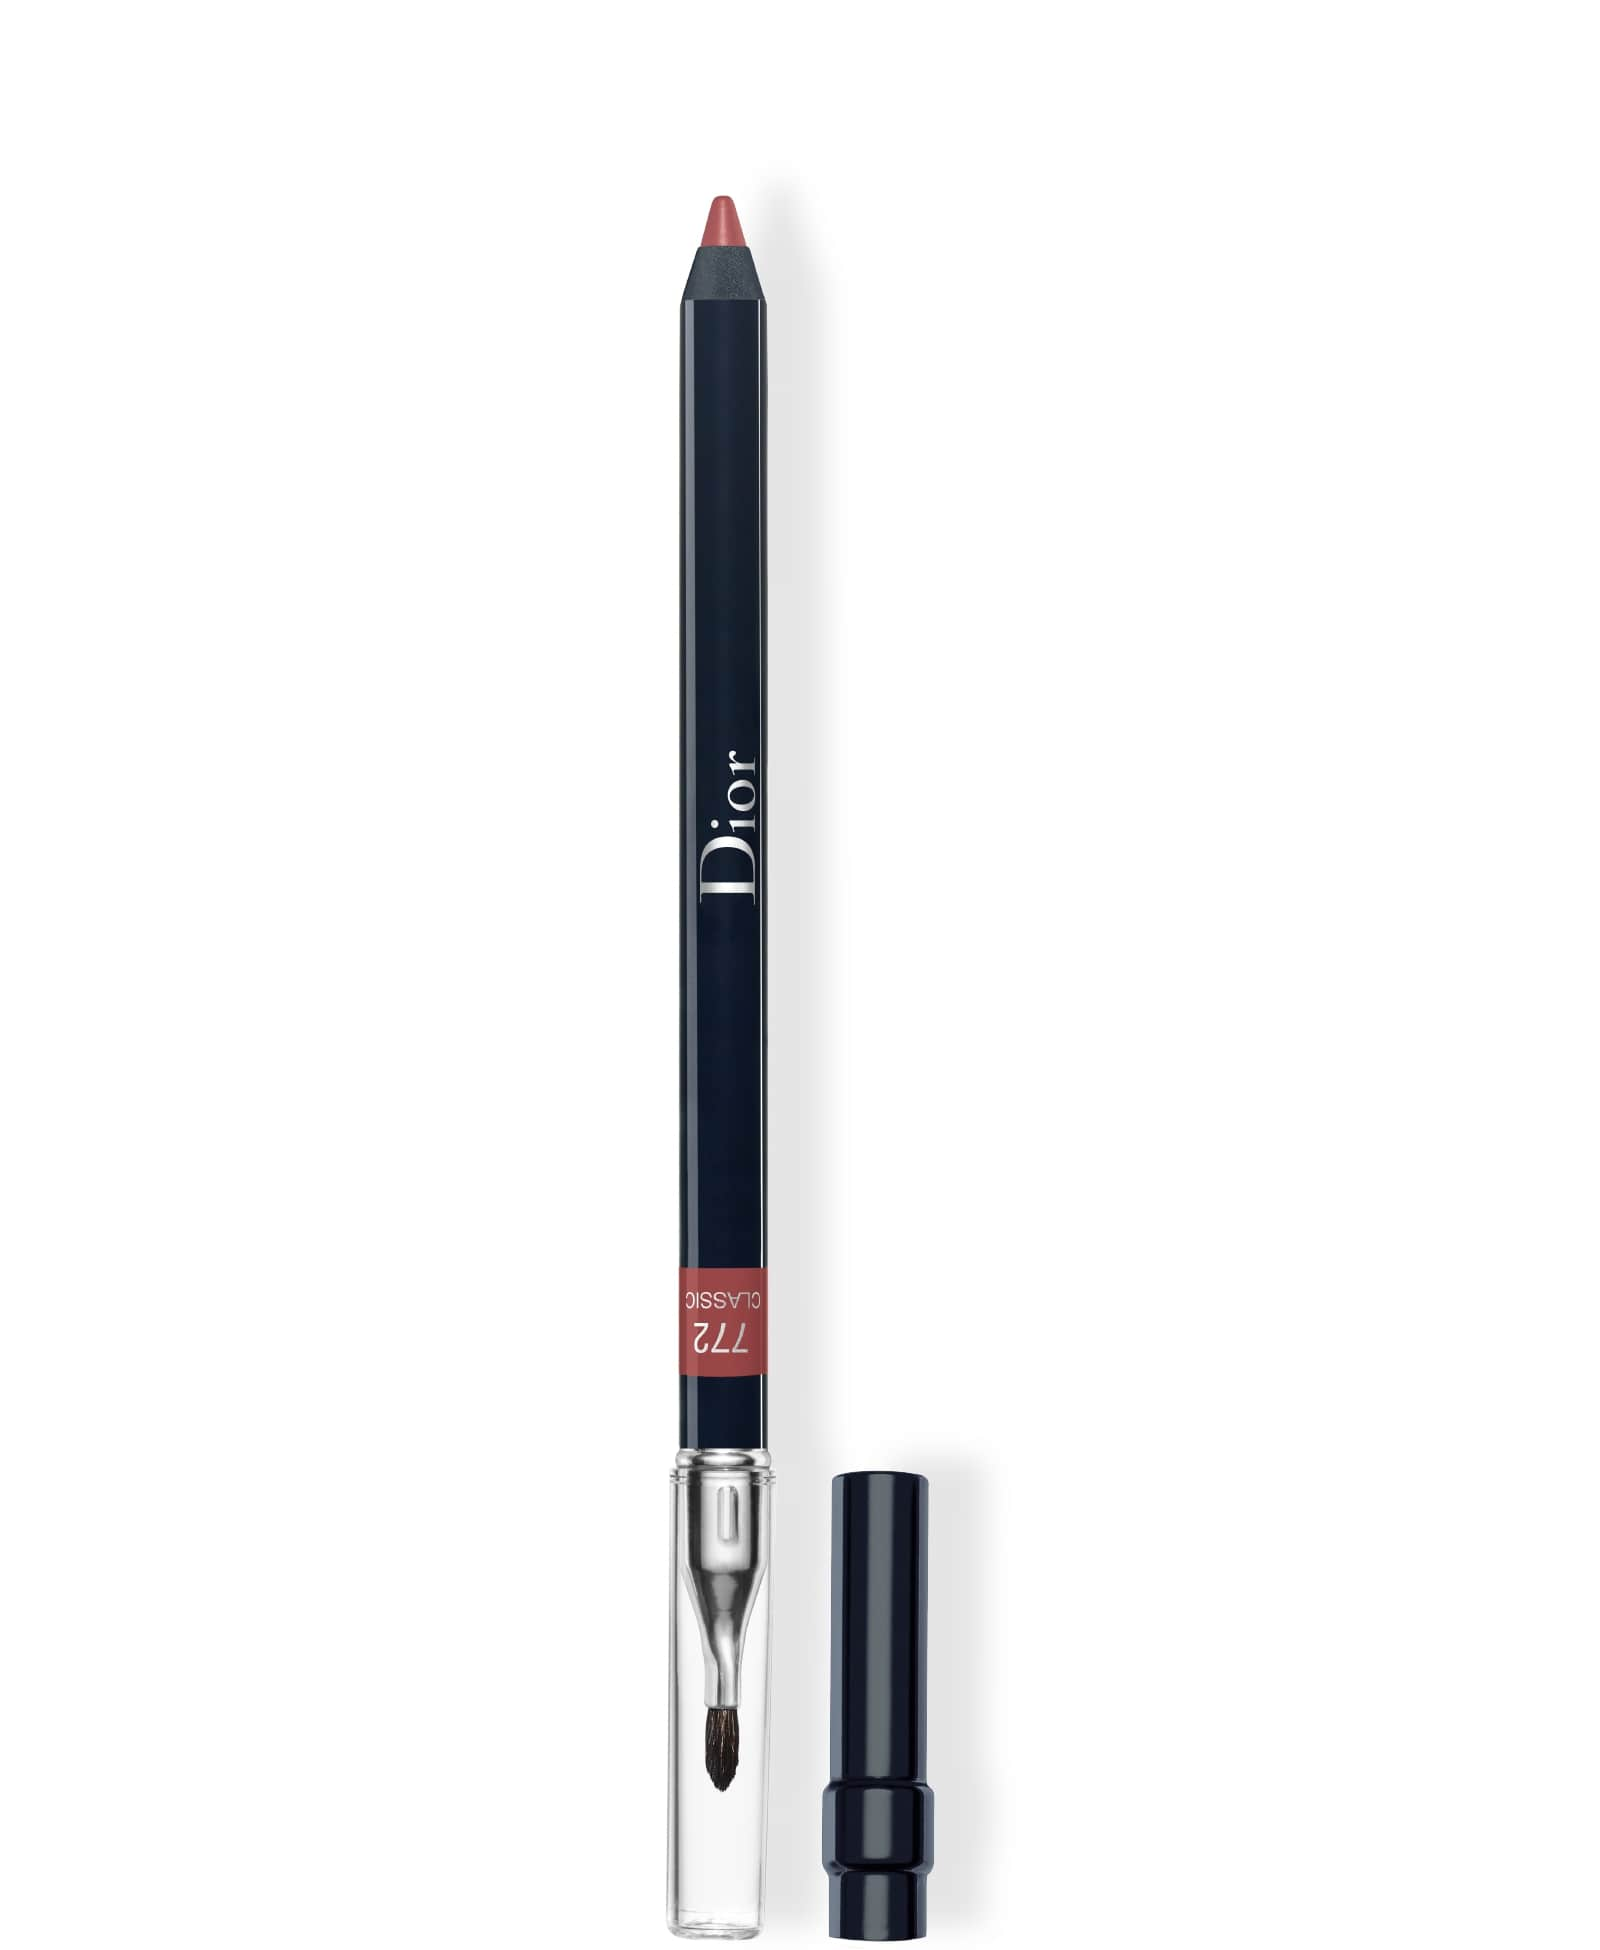 DIOR Contour Lipliner Pencil, 772 classic